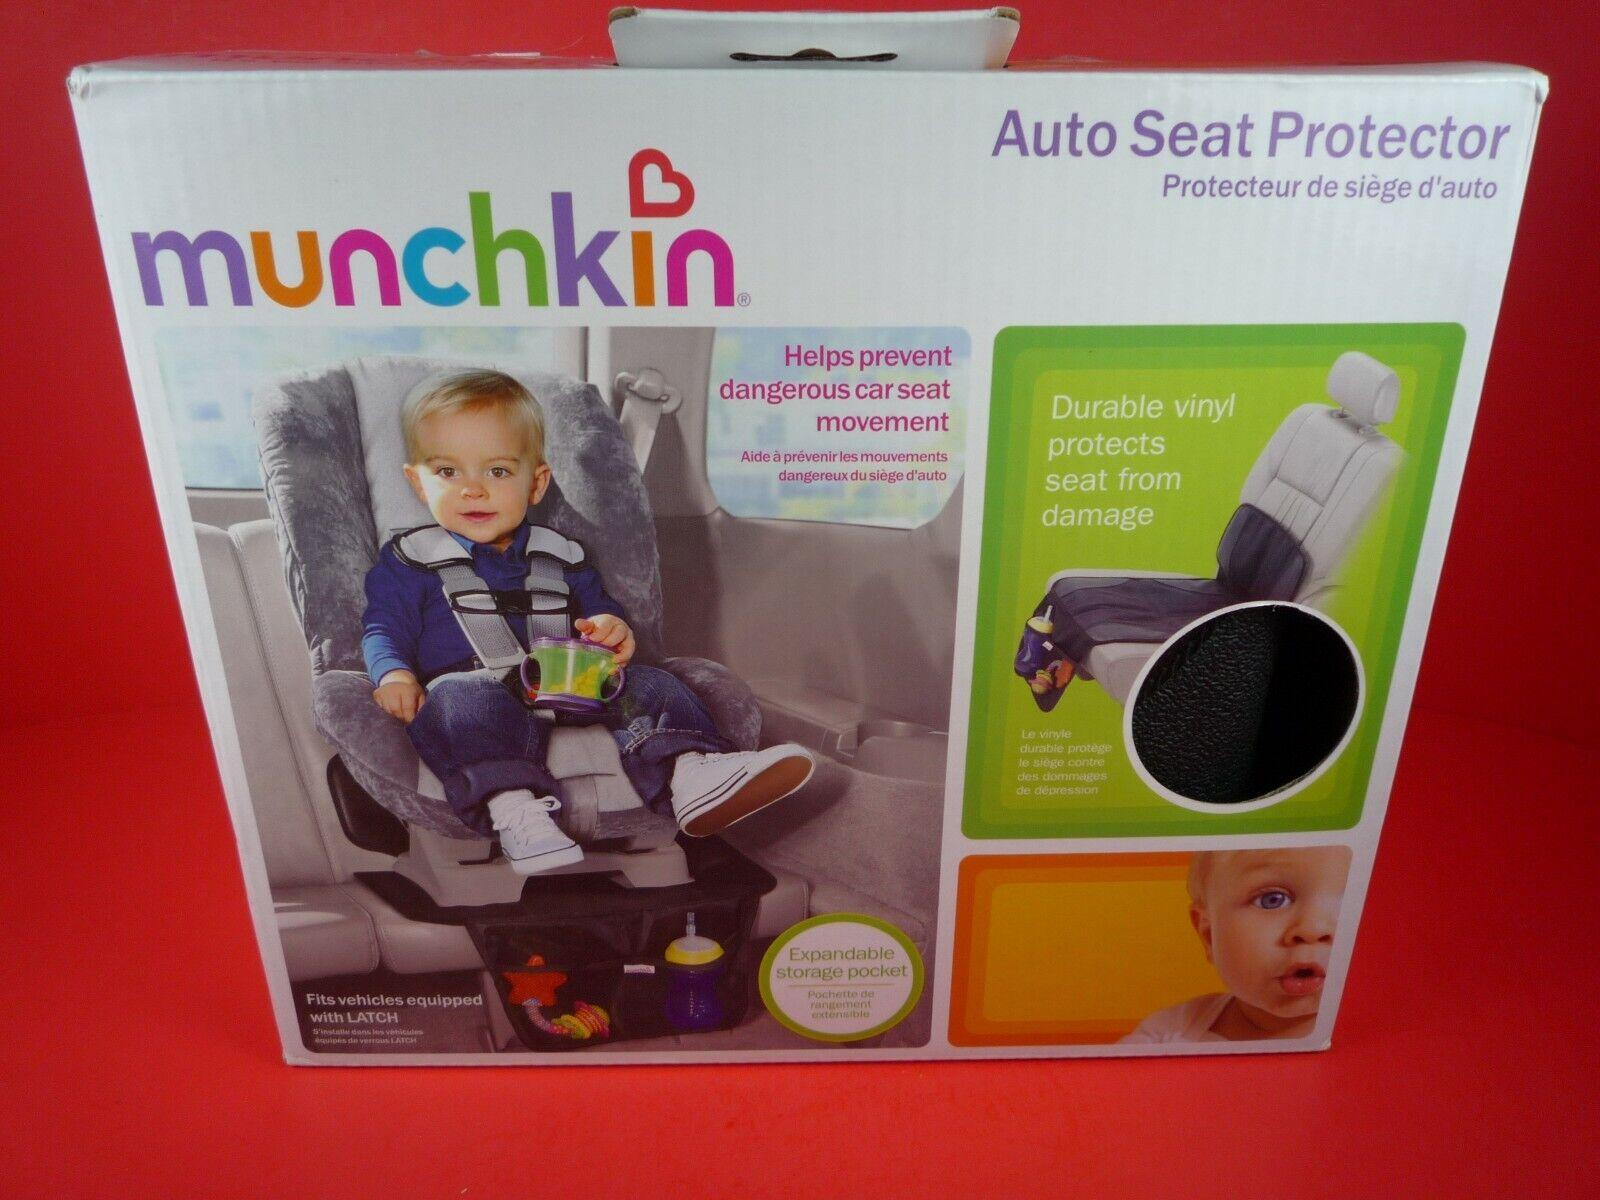 Munchkin 2730127306 Auto Seat Protector